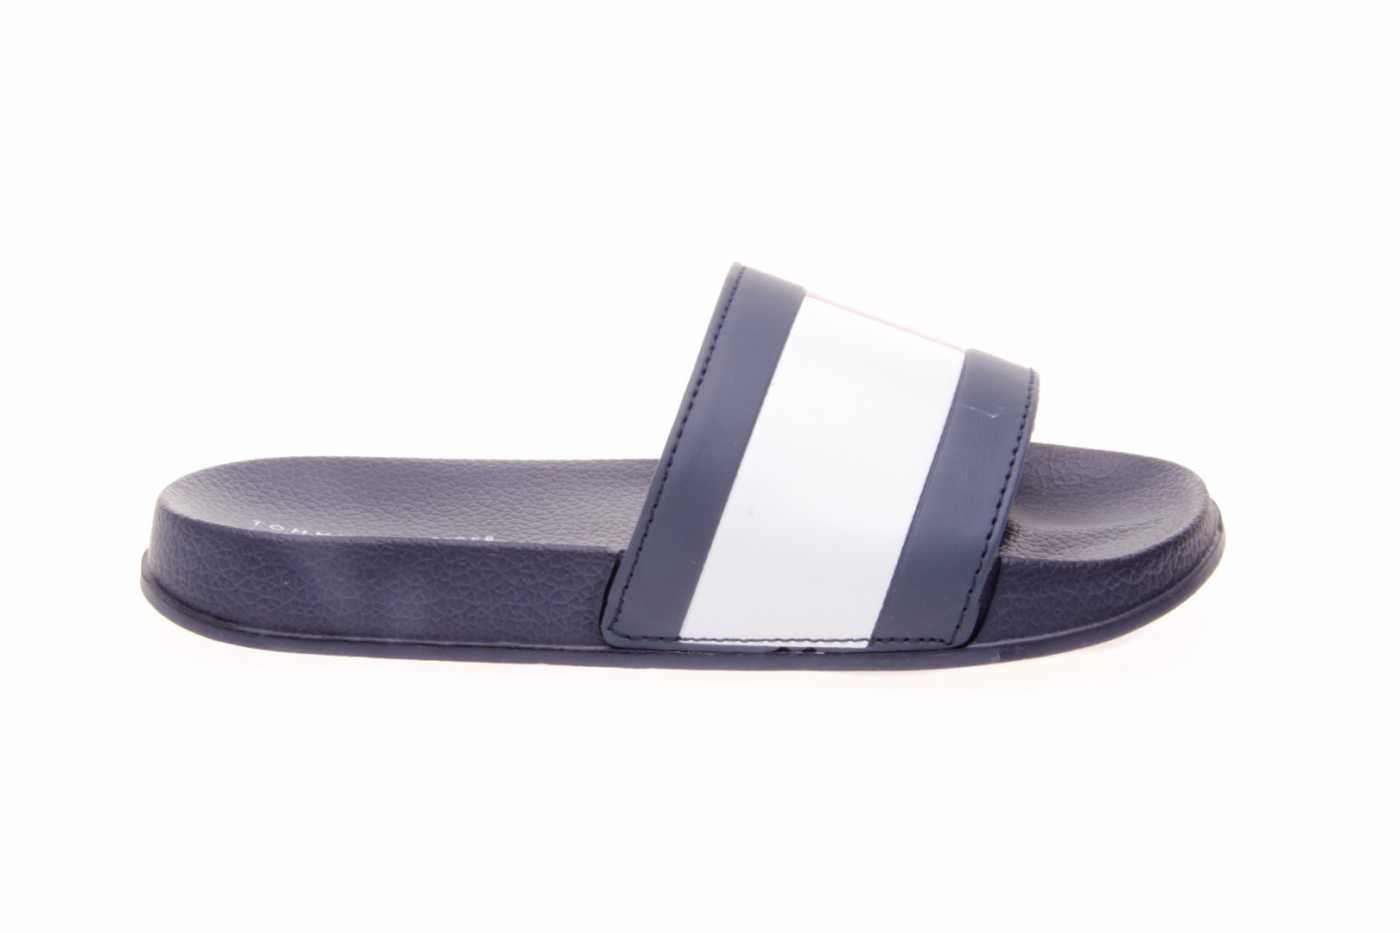 c298f7f0773 Comprar zapato tipo JOVEN NIÑO estilo SANDALIA COLOR AZUL SINTETICO ...